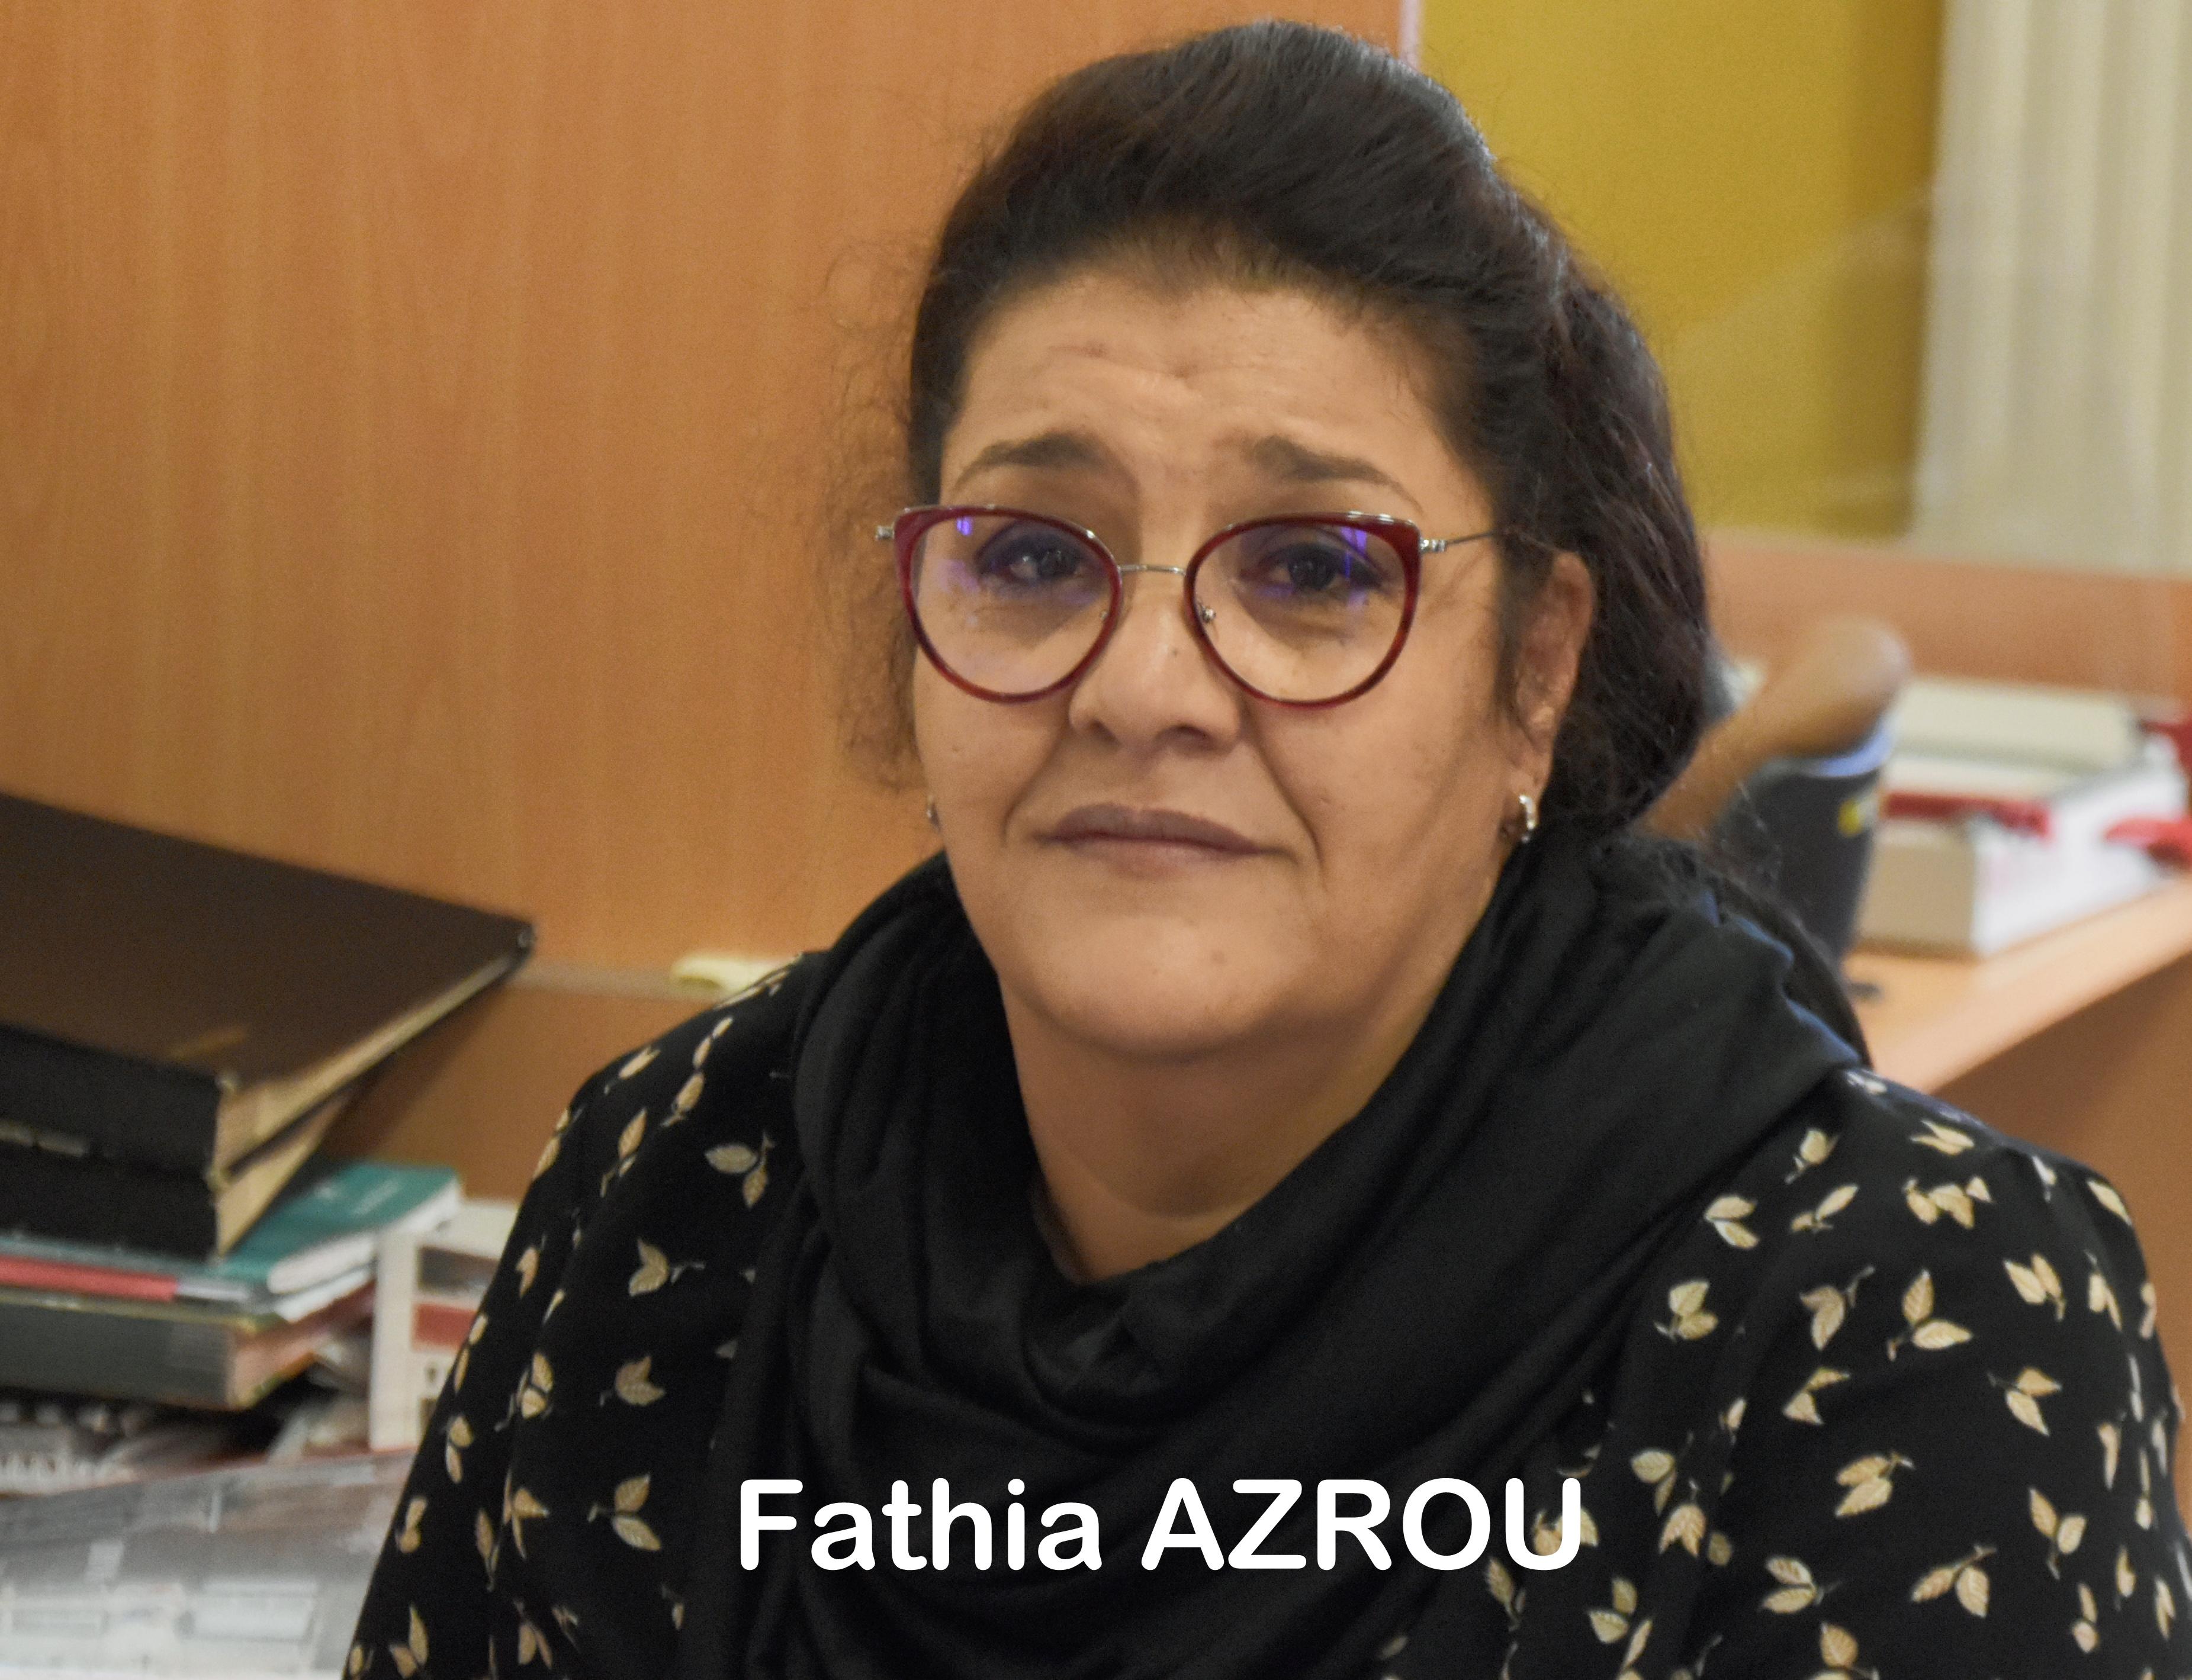 Fathia-11.jpg